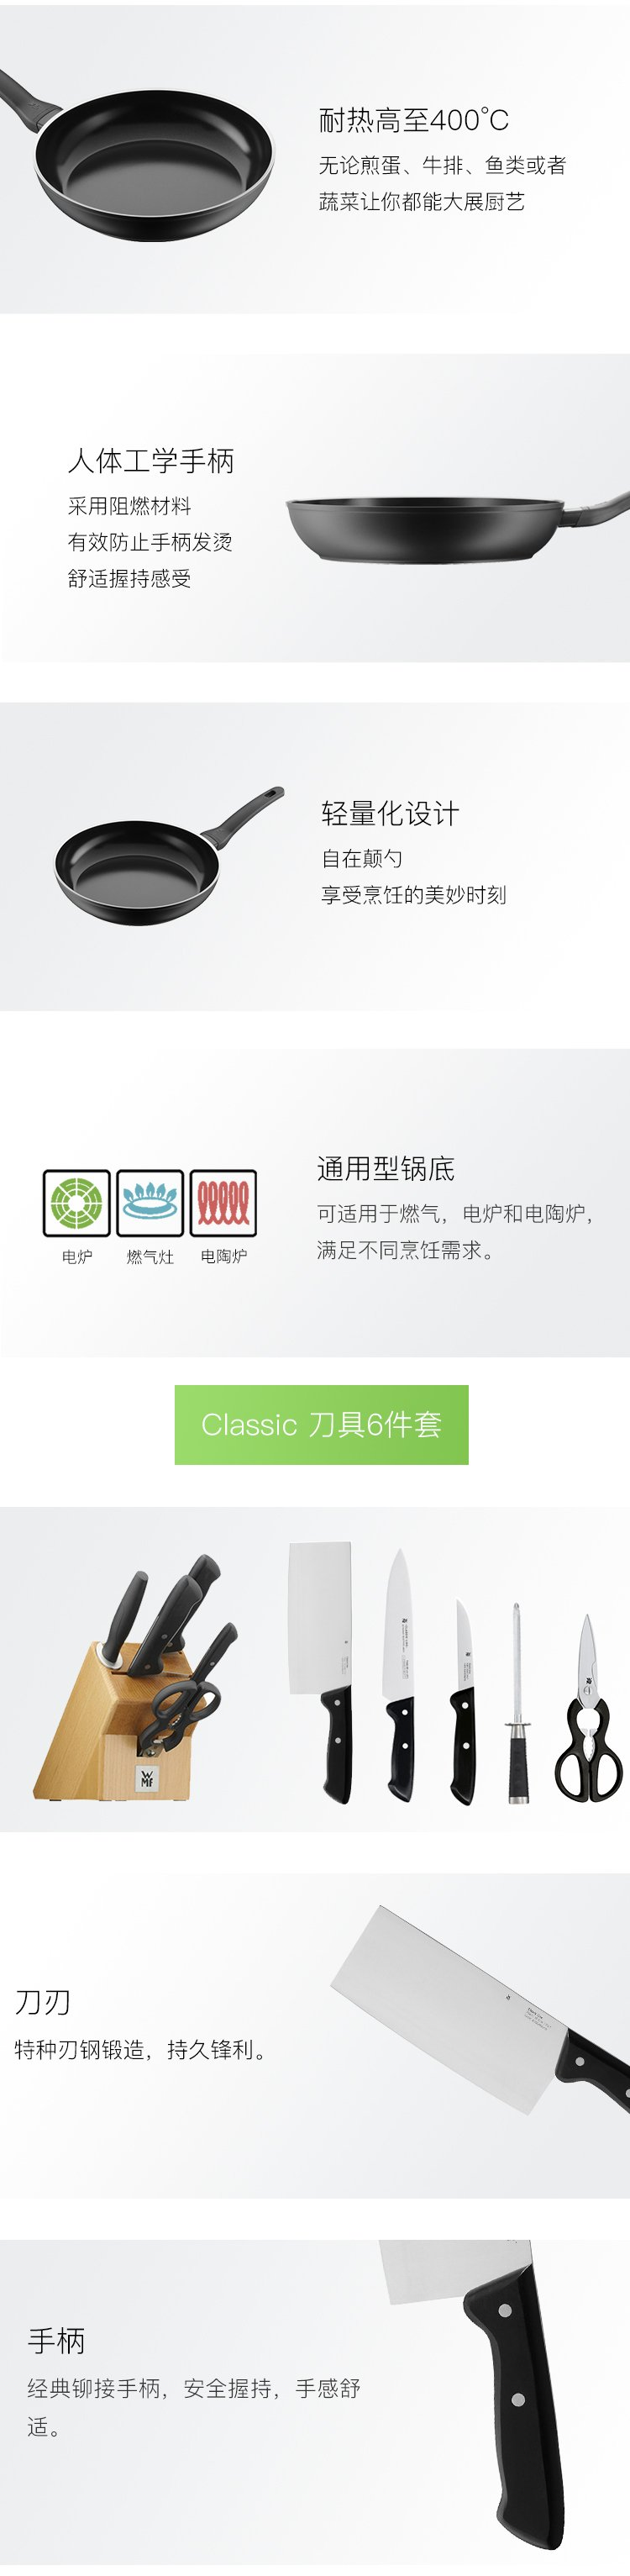 WMF 福腾宝 炒锅煎锅刀具套装